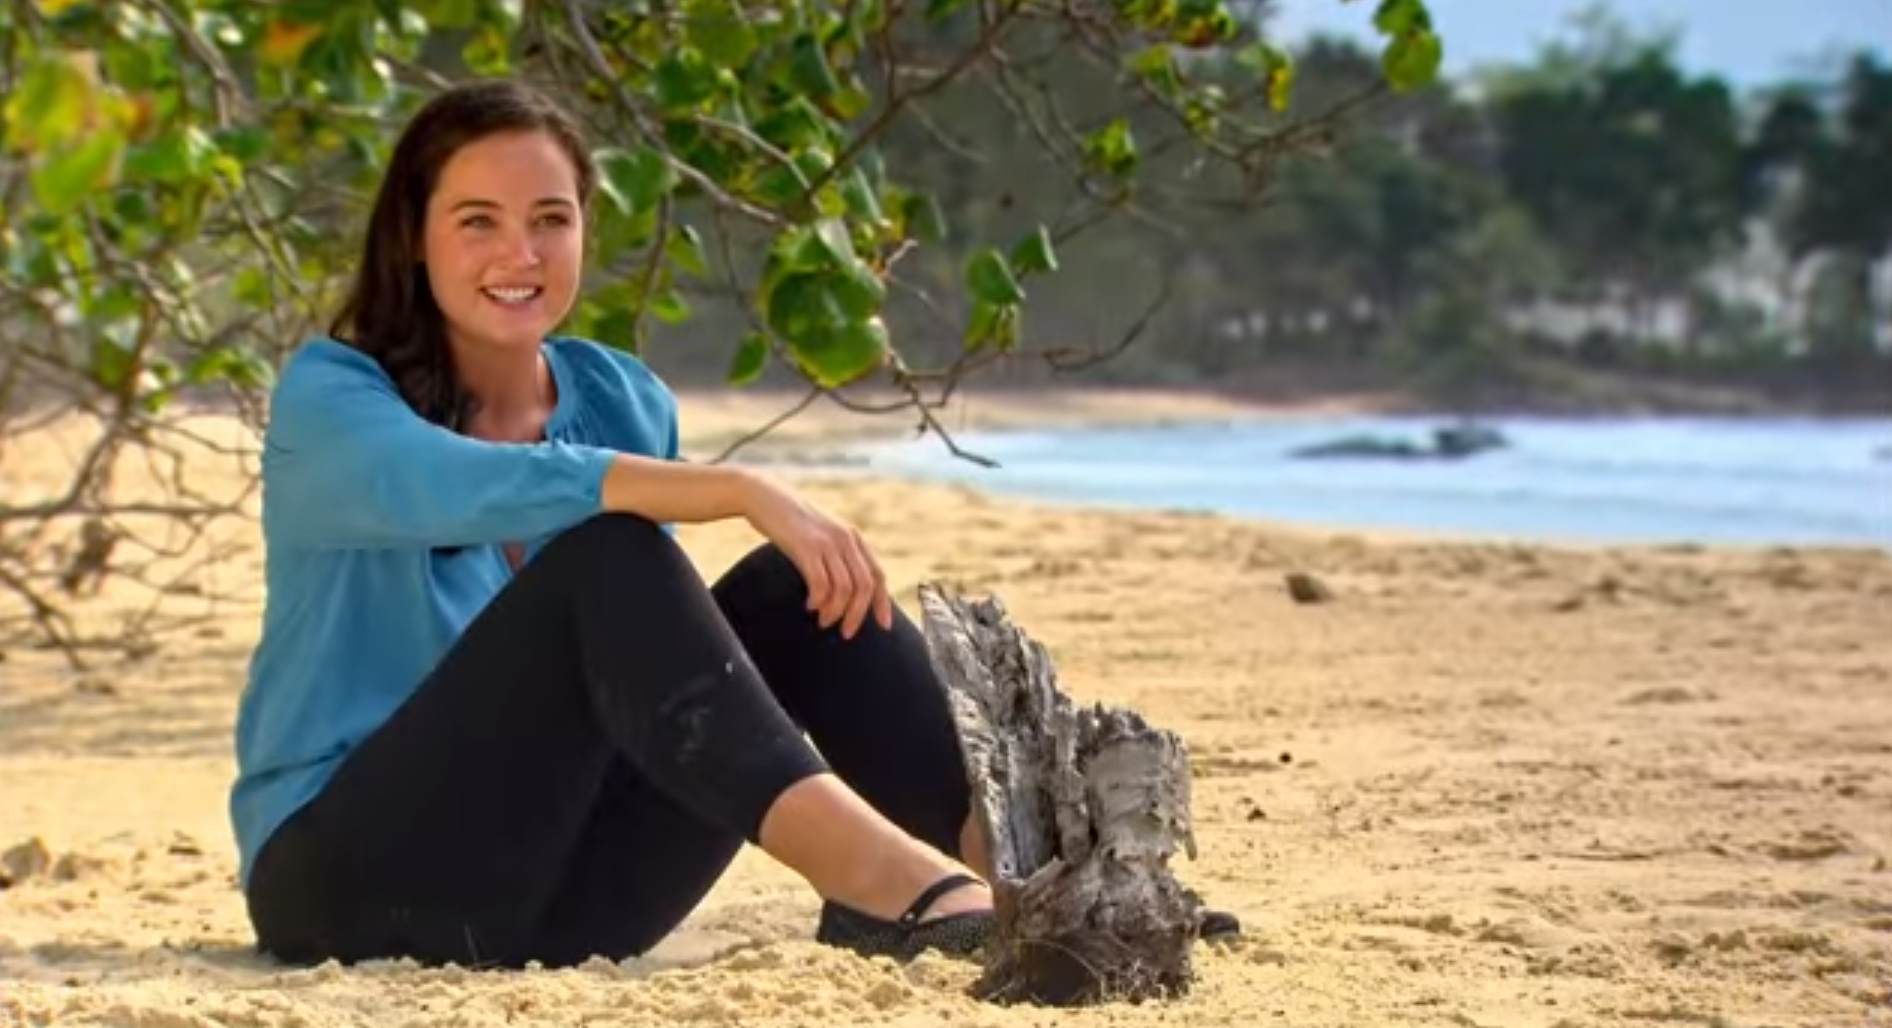 Liz revealed as Survivor: Kaoh Rong contestant